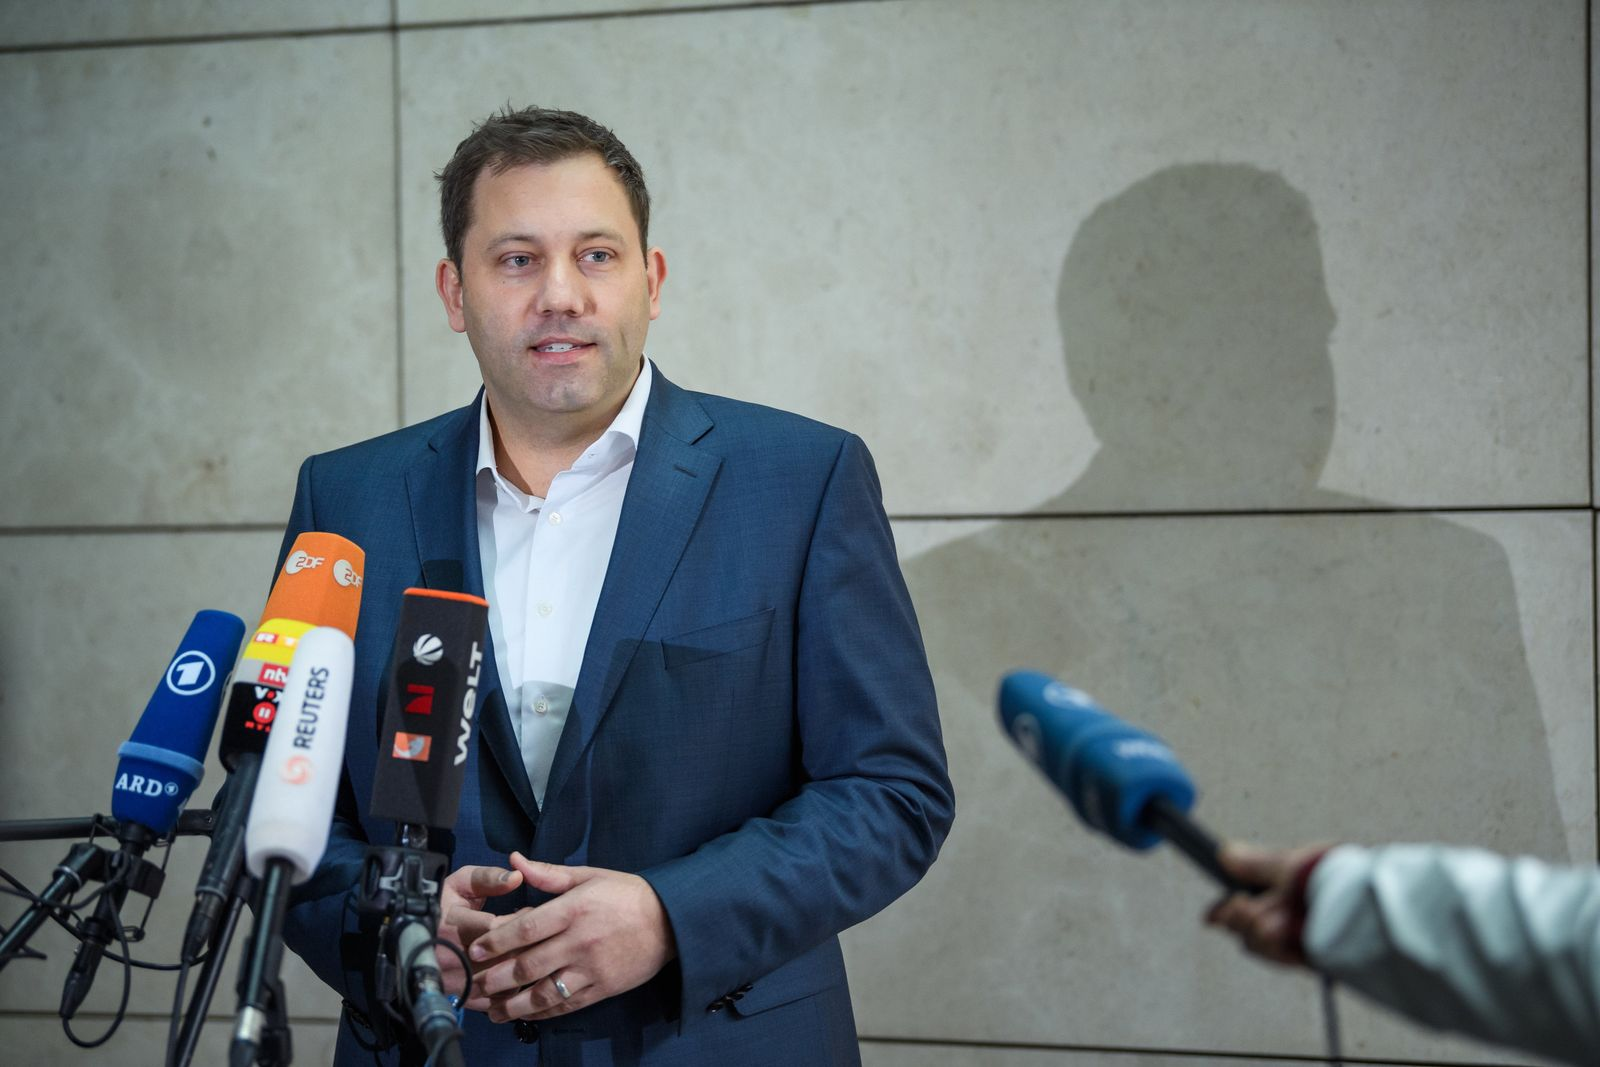 SPD Lars Klingbeil